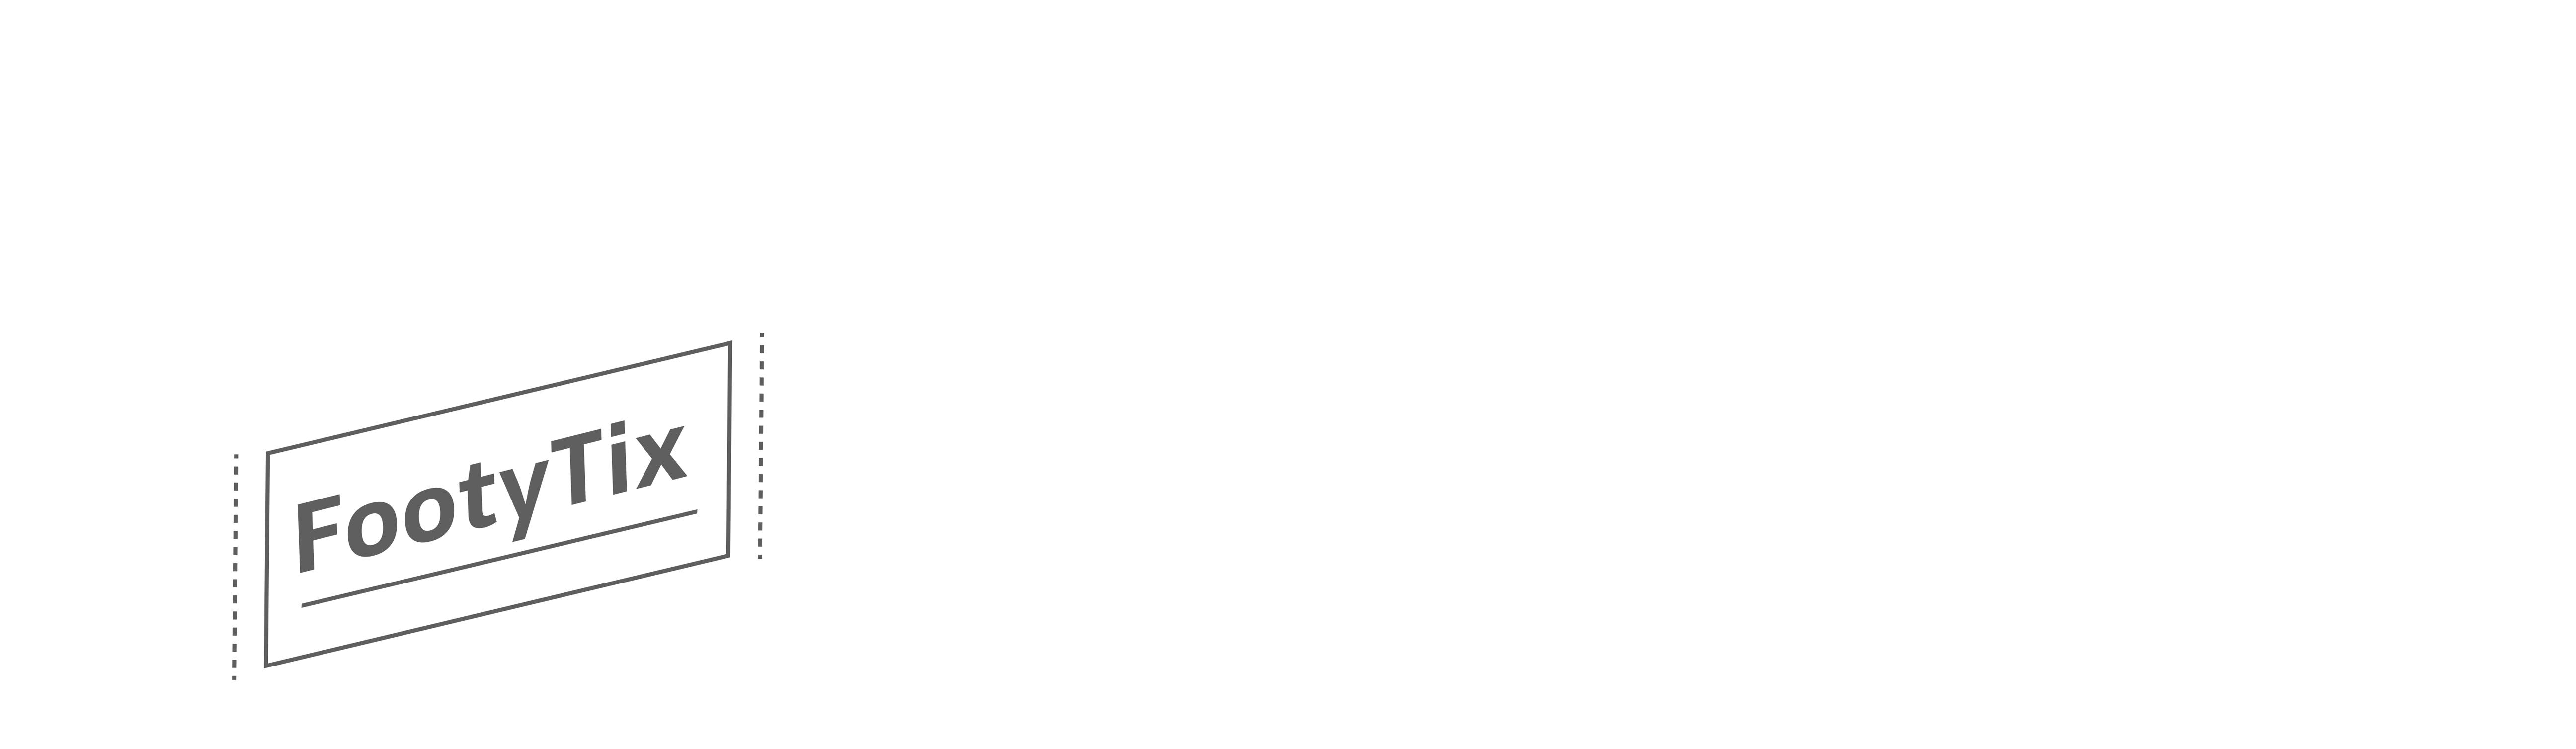 FootyTix-海外サッカーチケット攻略ブログ